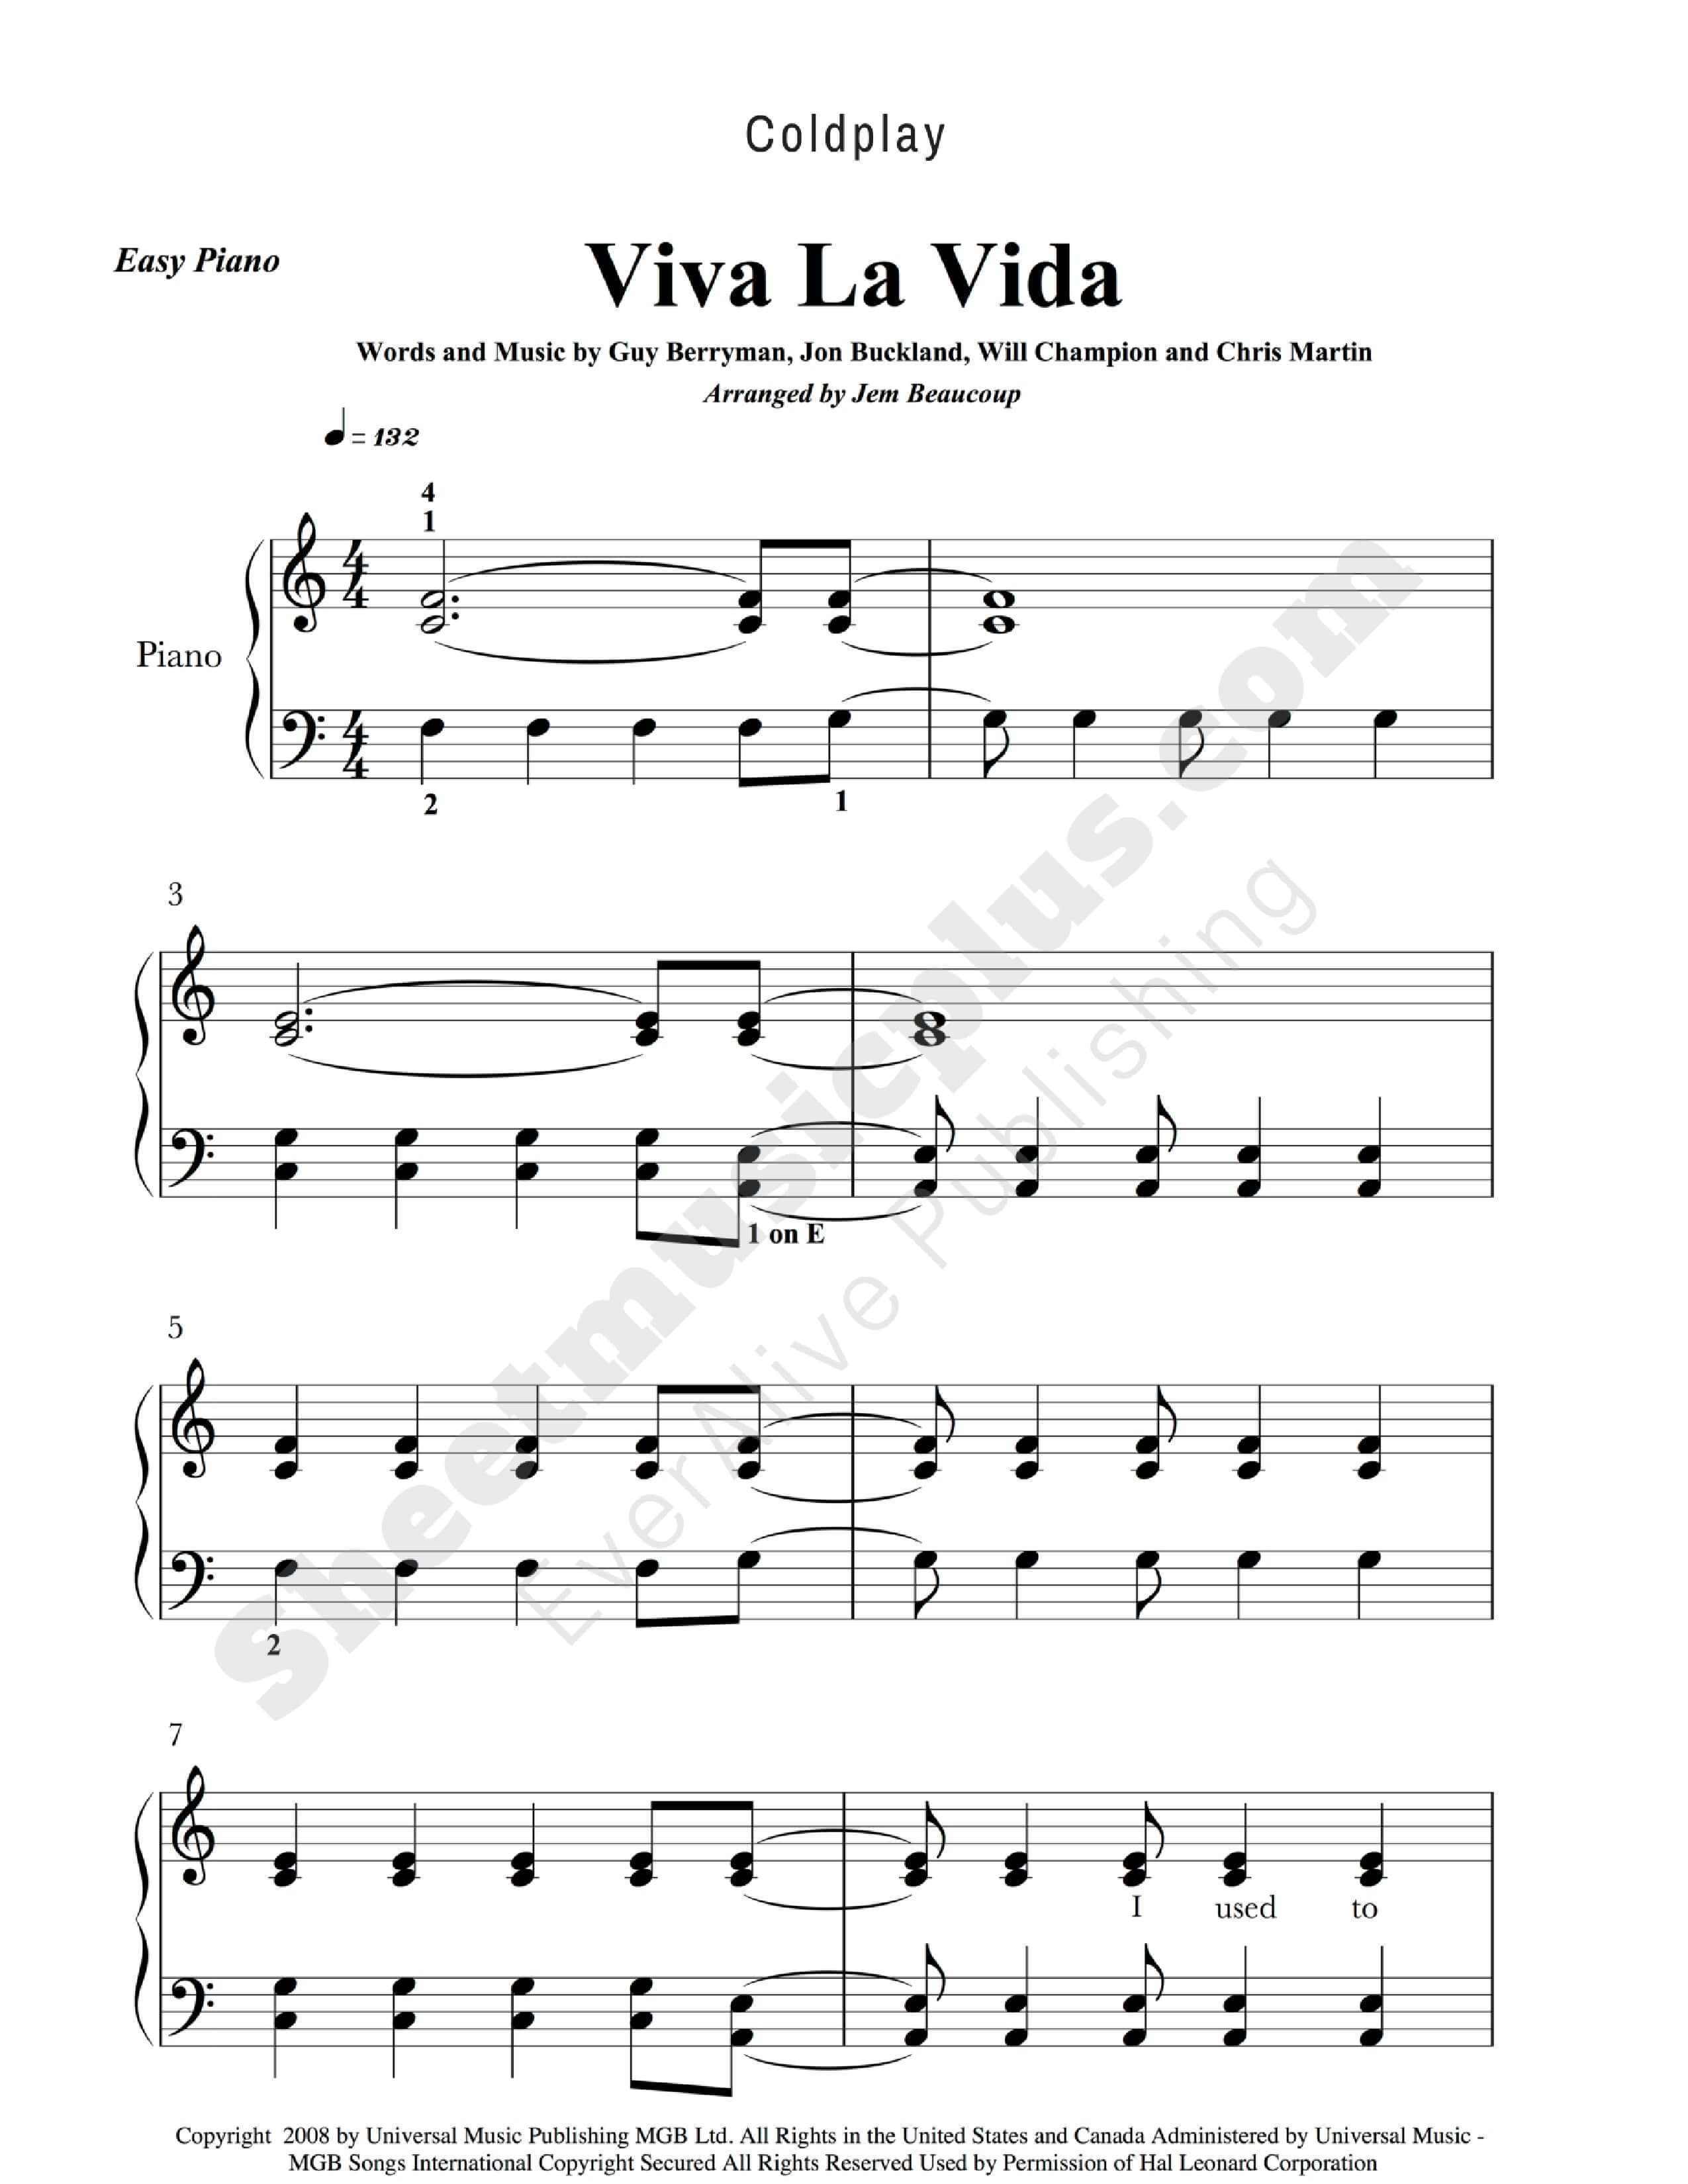 Coldplay Viva La Vida Easy Piano Music Download And Print